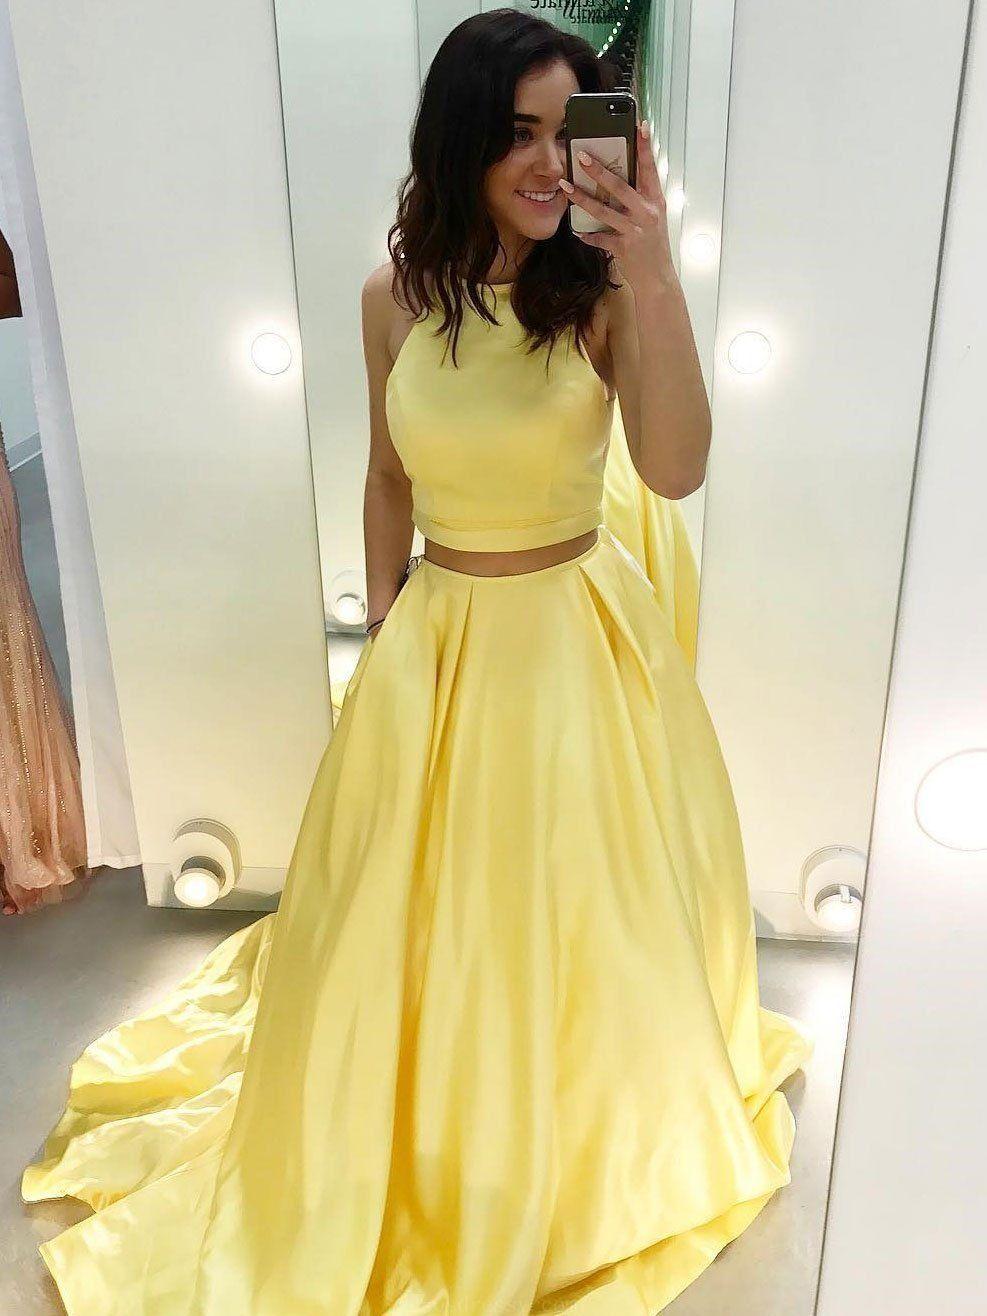 2018 prom dress two pieces prom dress yellow prom dress